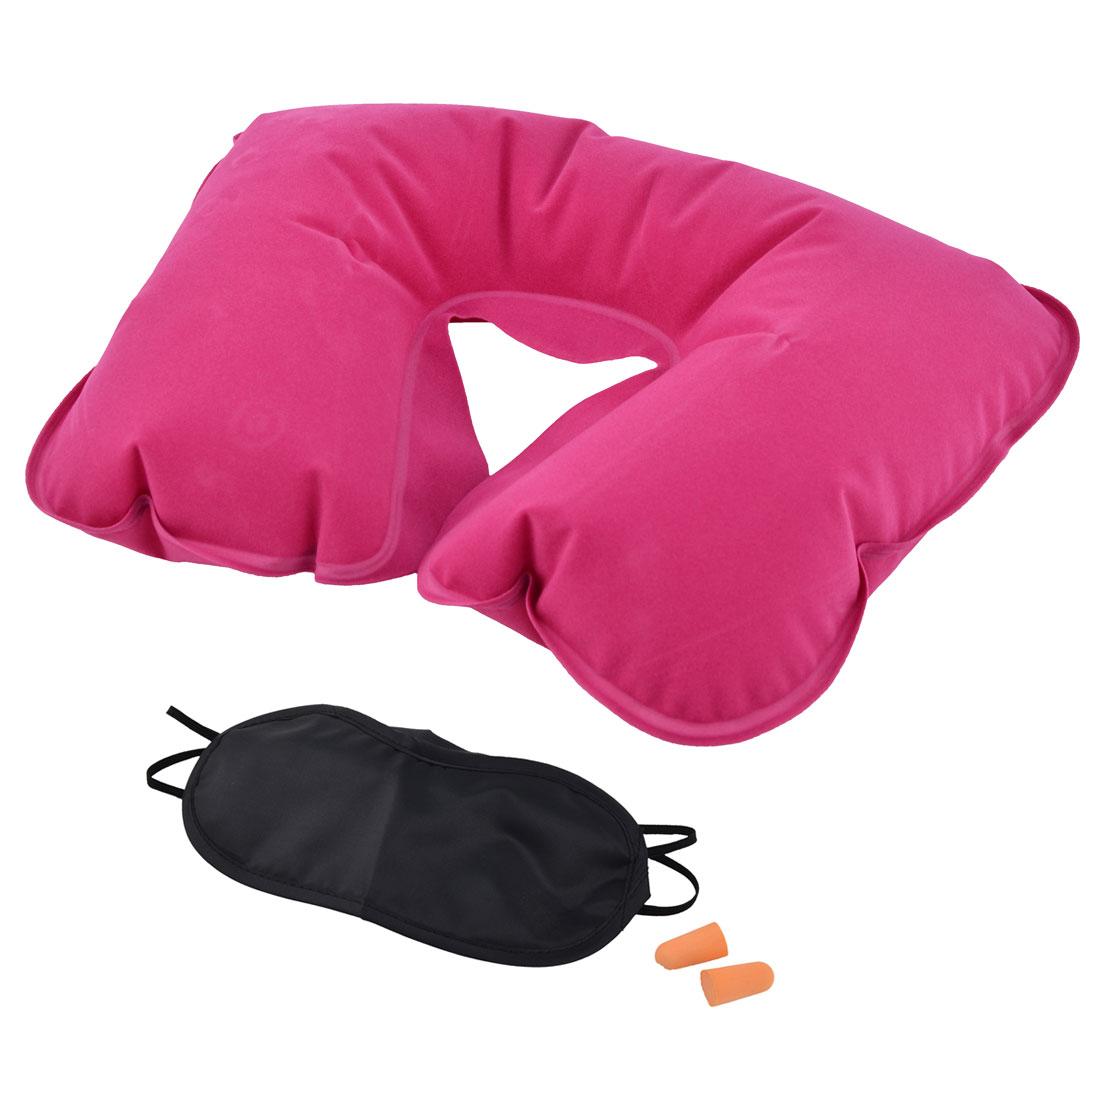 U Shape Pillow Sleeping Relax Inflatable Neck Eyes Earphone Fuchsia 3 in 1